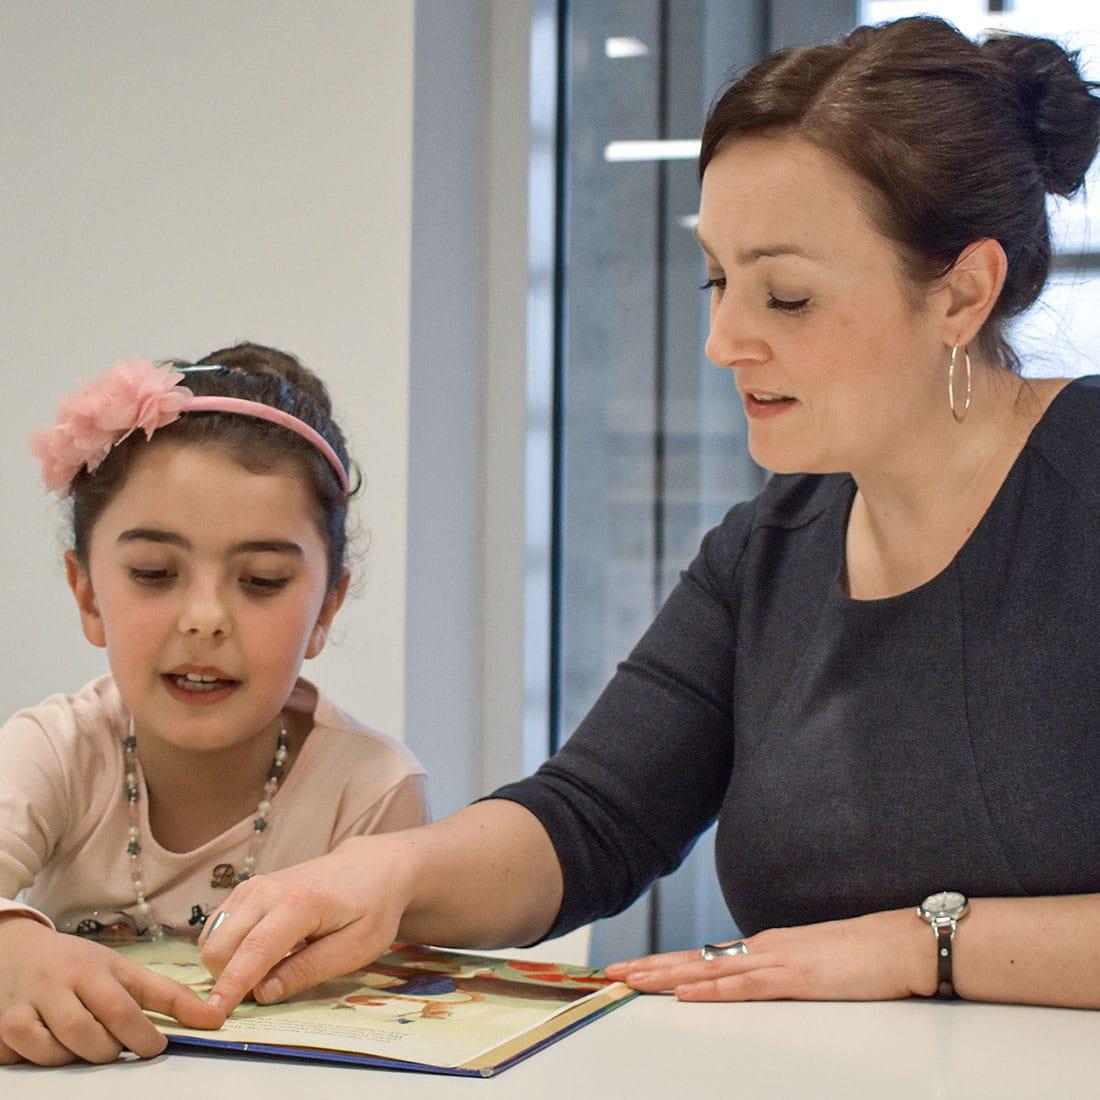 KinderHelden Projekt Ich Kanns Bildergalerie